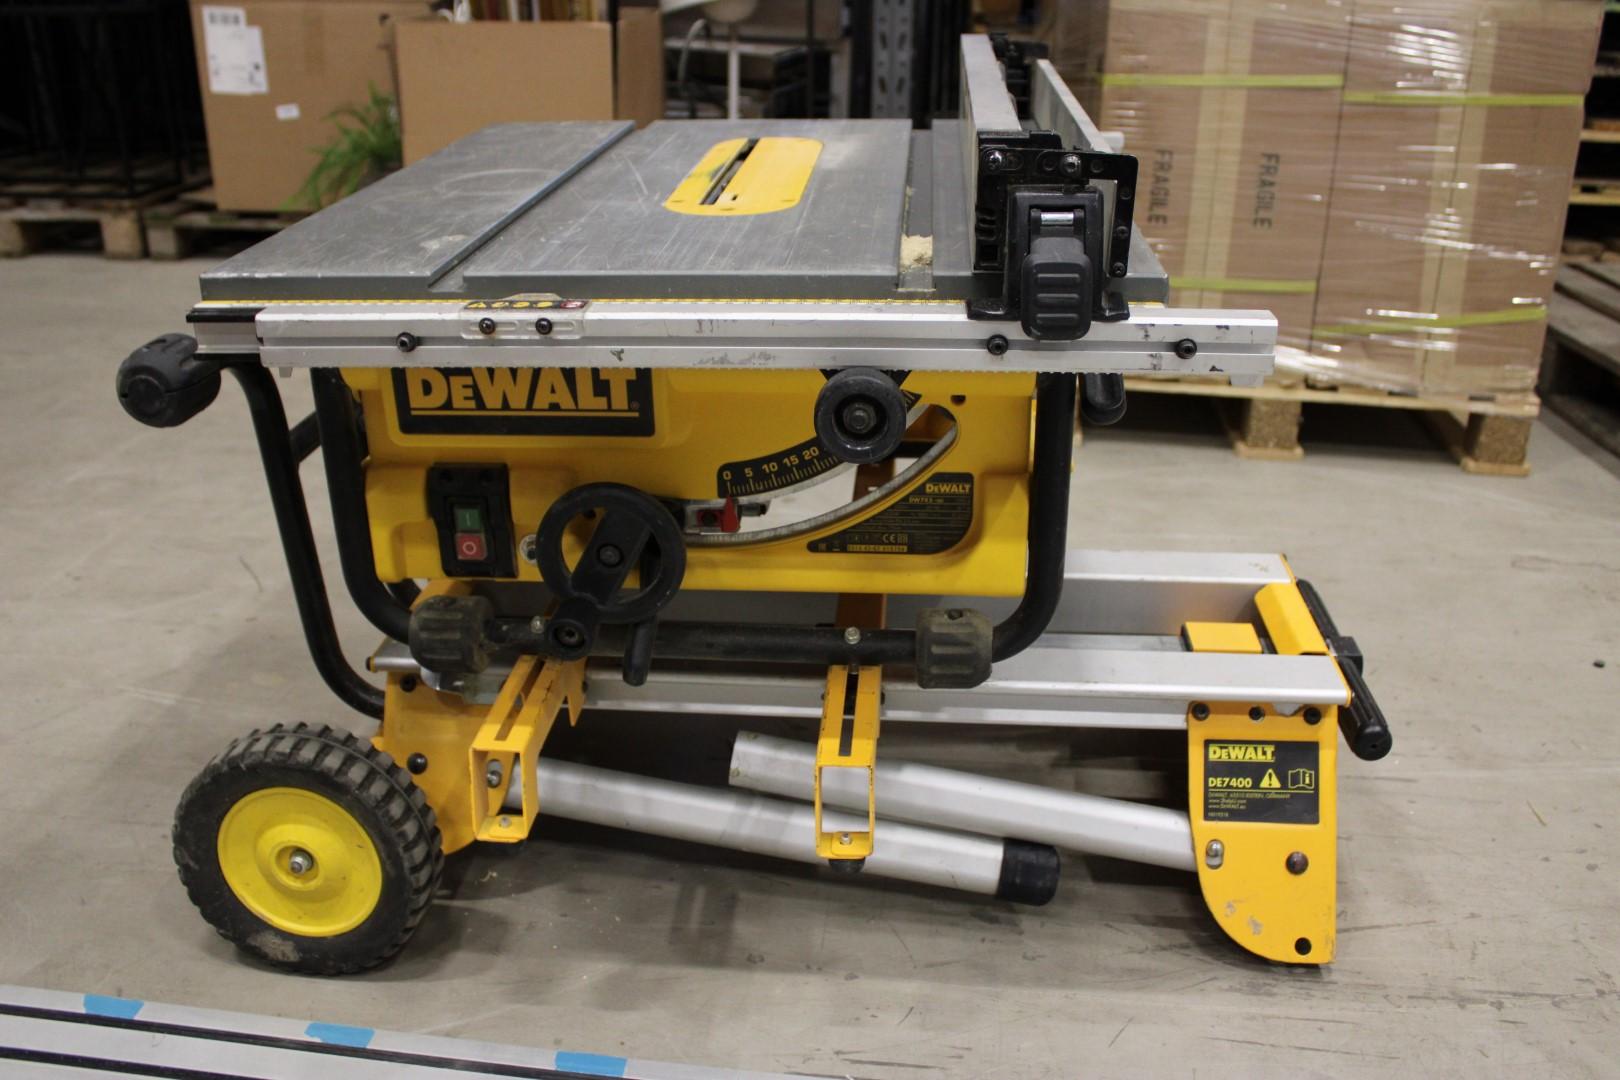 Bra Kapsåg med sågbord, DeWalt DW745-QS / DE7400 - PS Auction – Vi NX-51